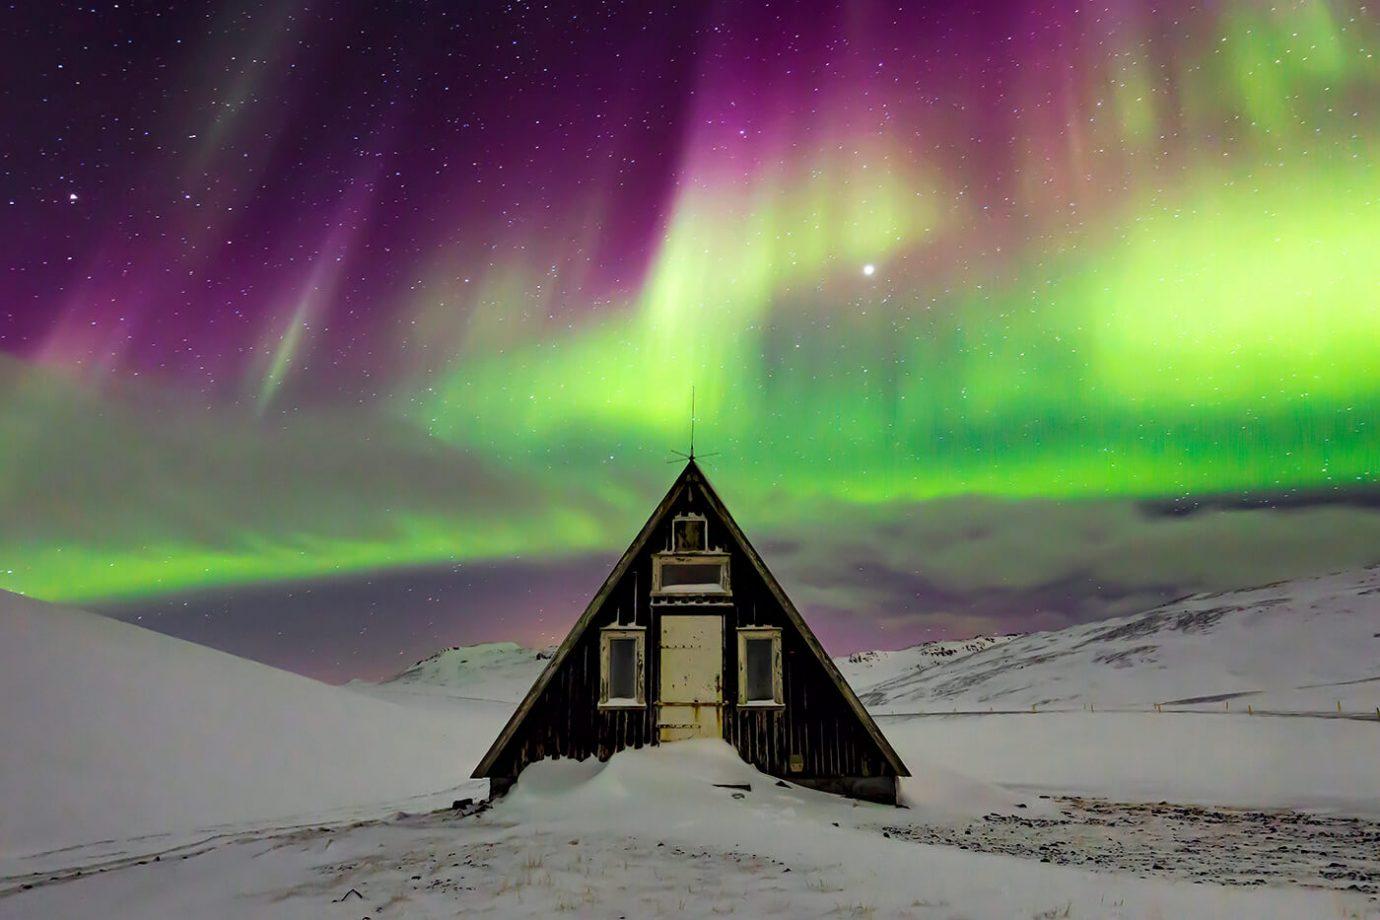 Aurora Borealis, Emergency Mountain Hut, Snæfellsnes Peninsula, Iceland